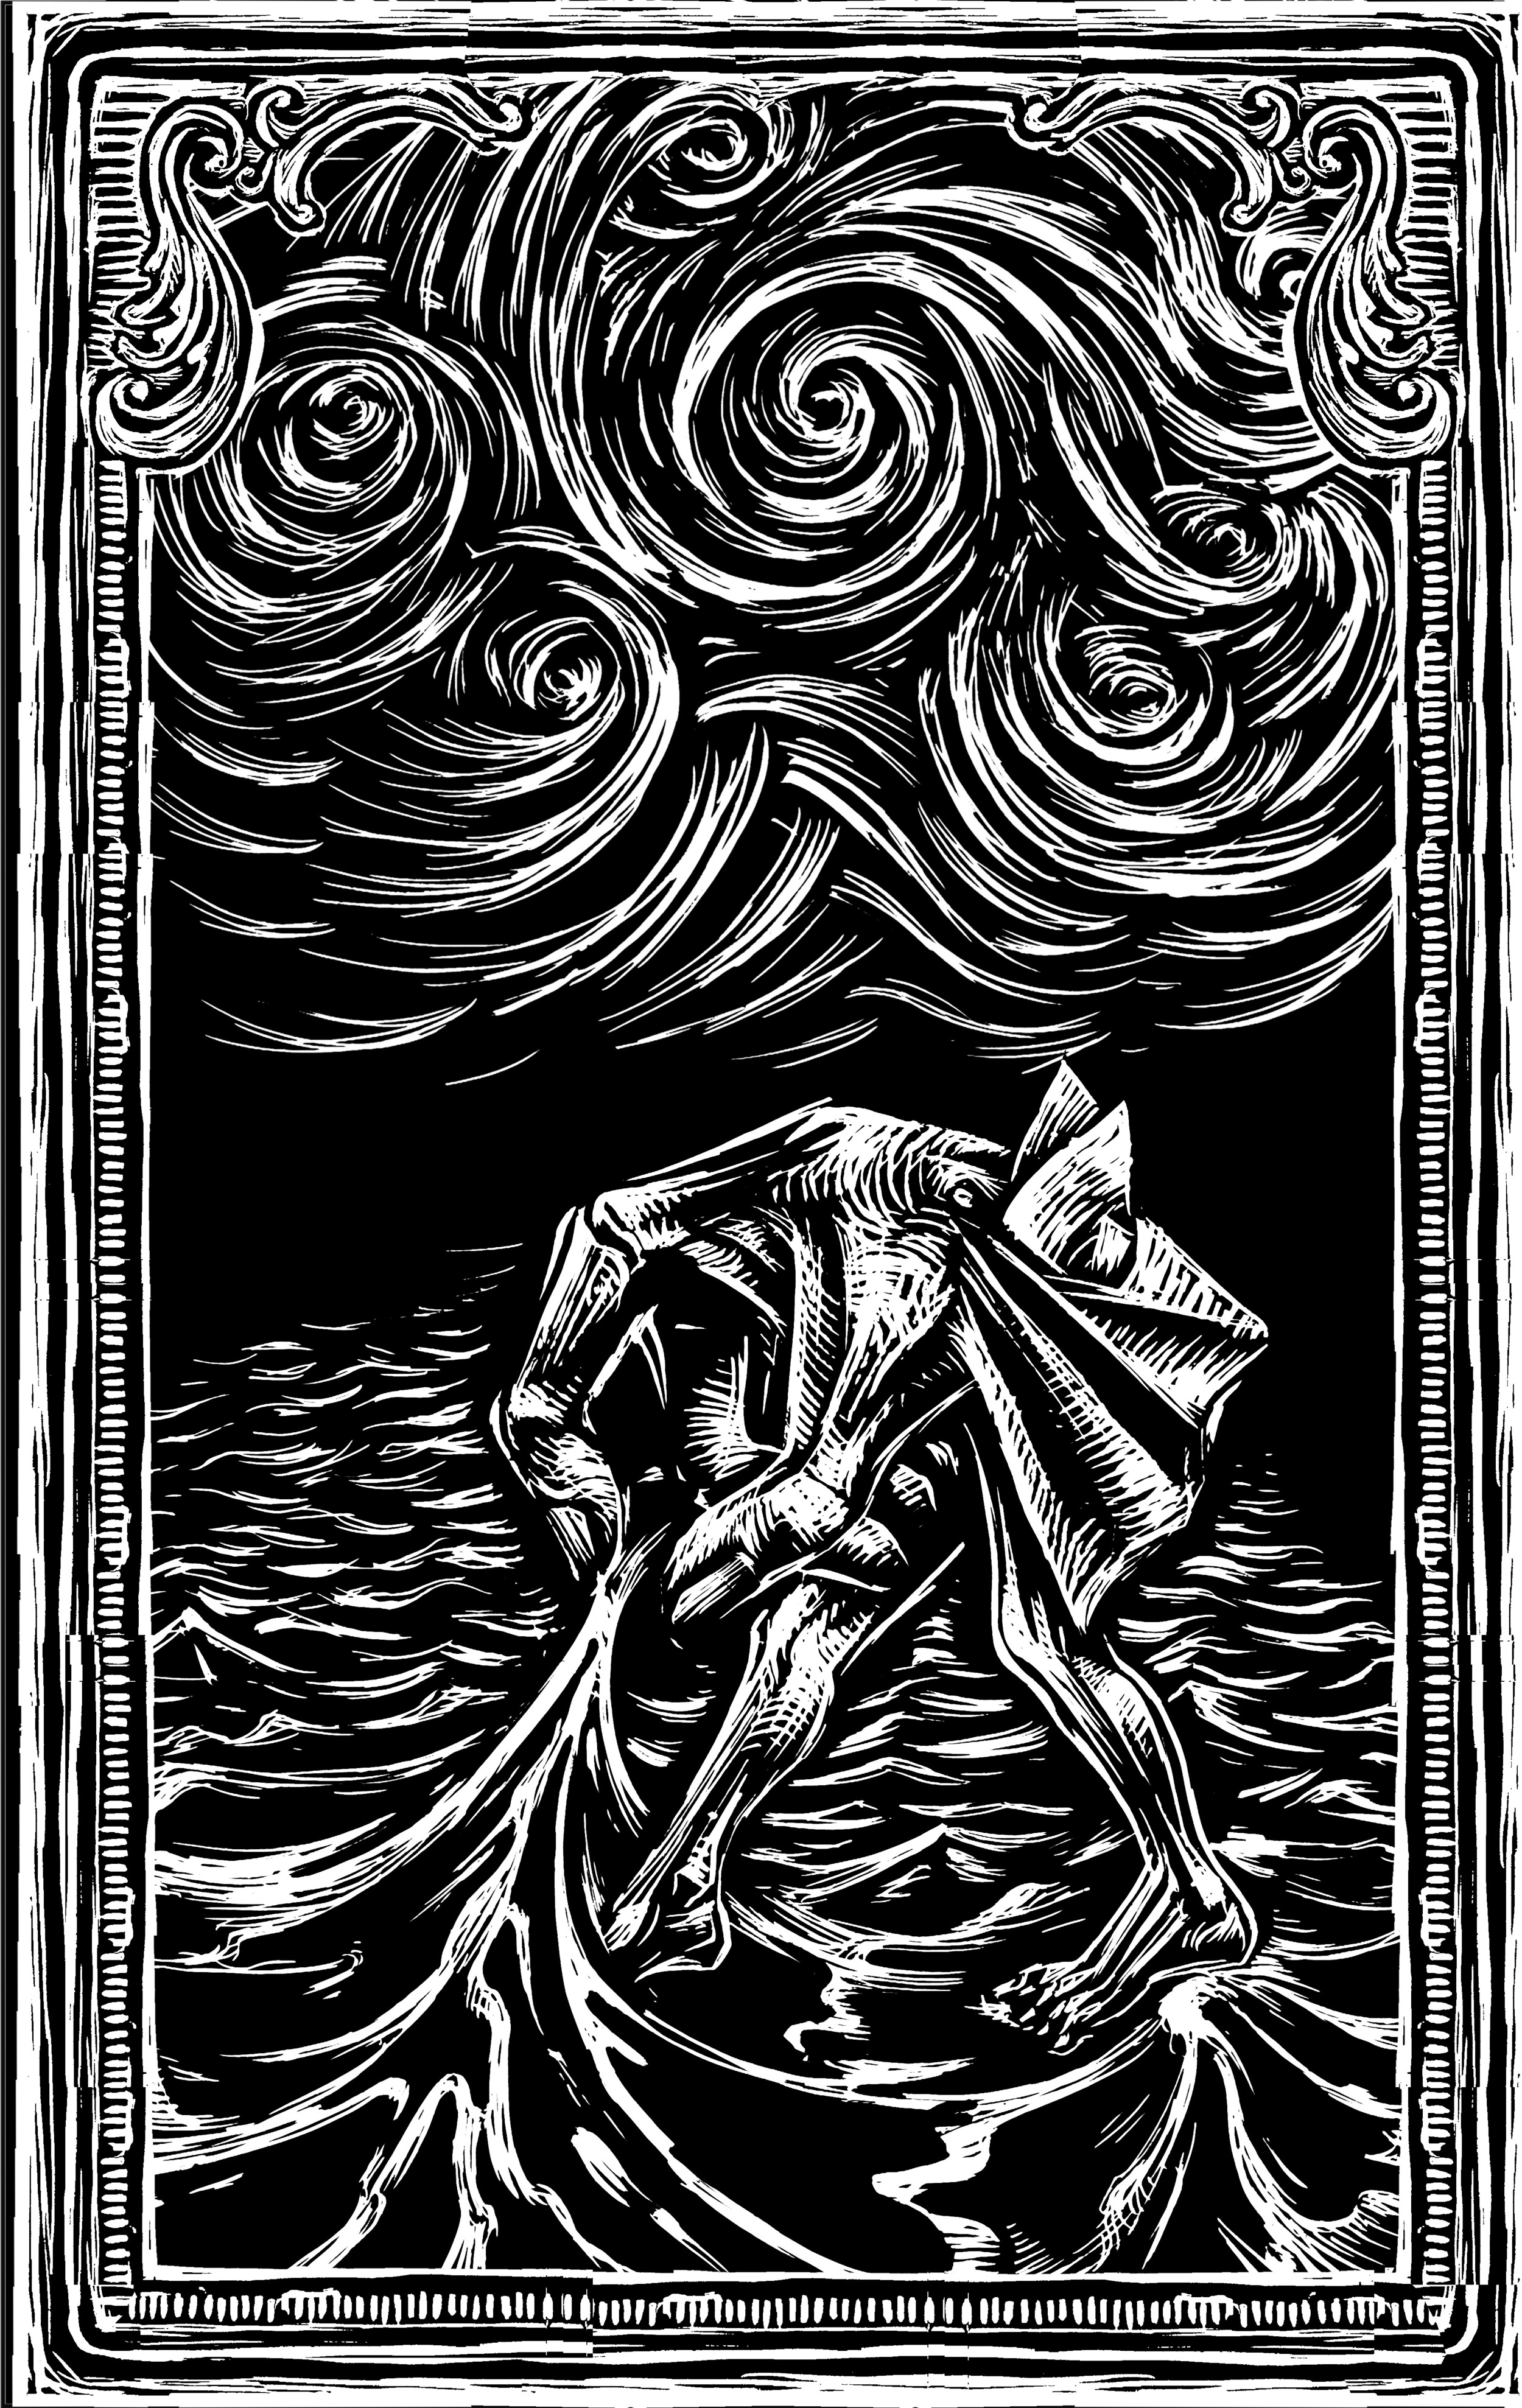 Don Quixote, upon entering Barcelona, contemplates the sea